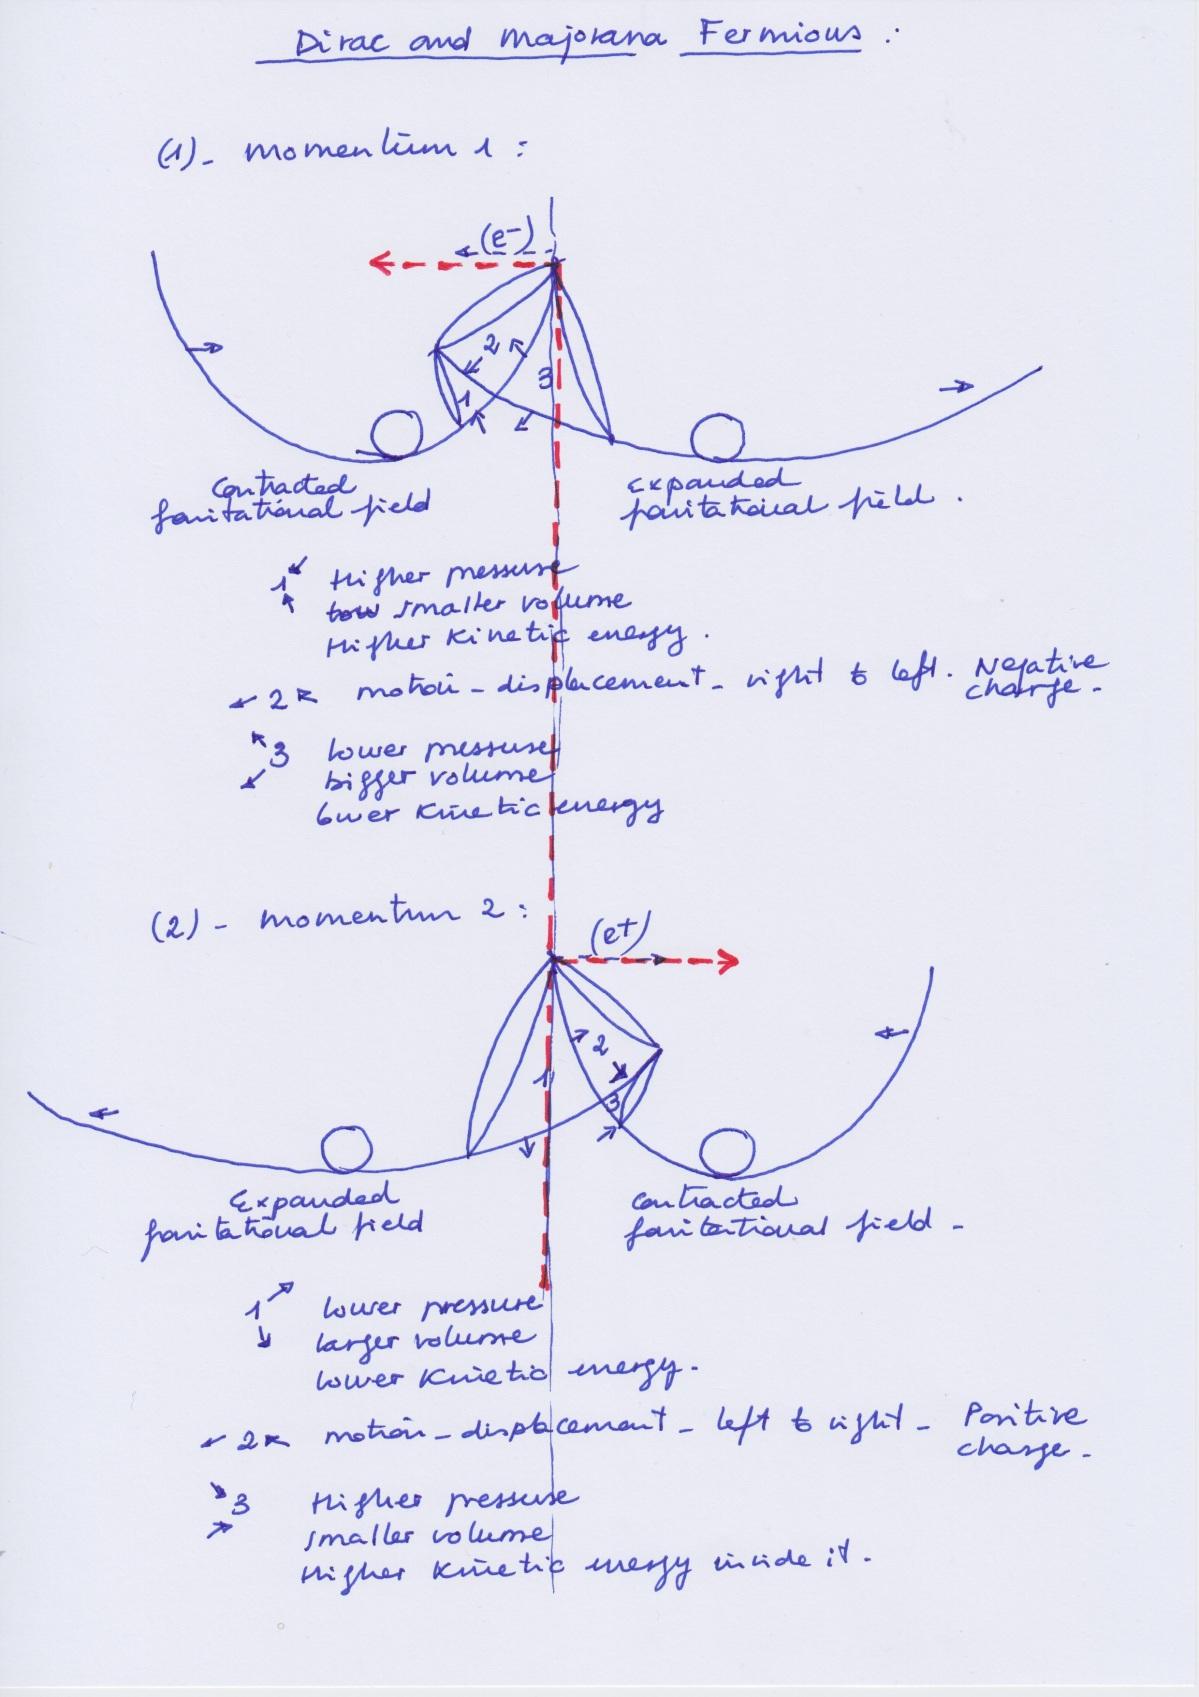 Dirac_Majorana_Fermions_2